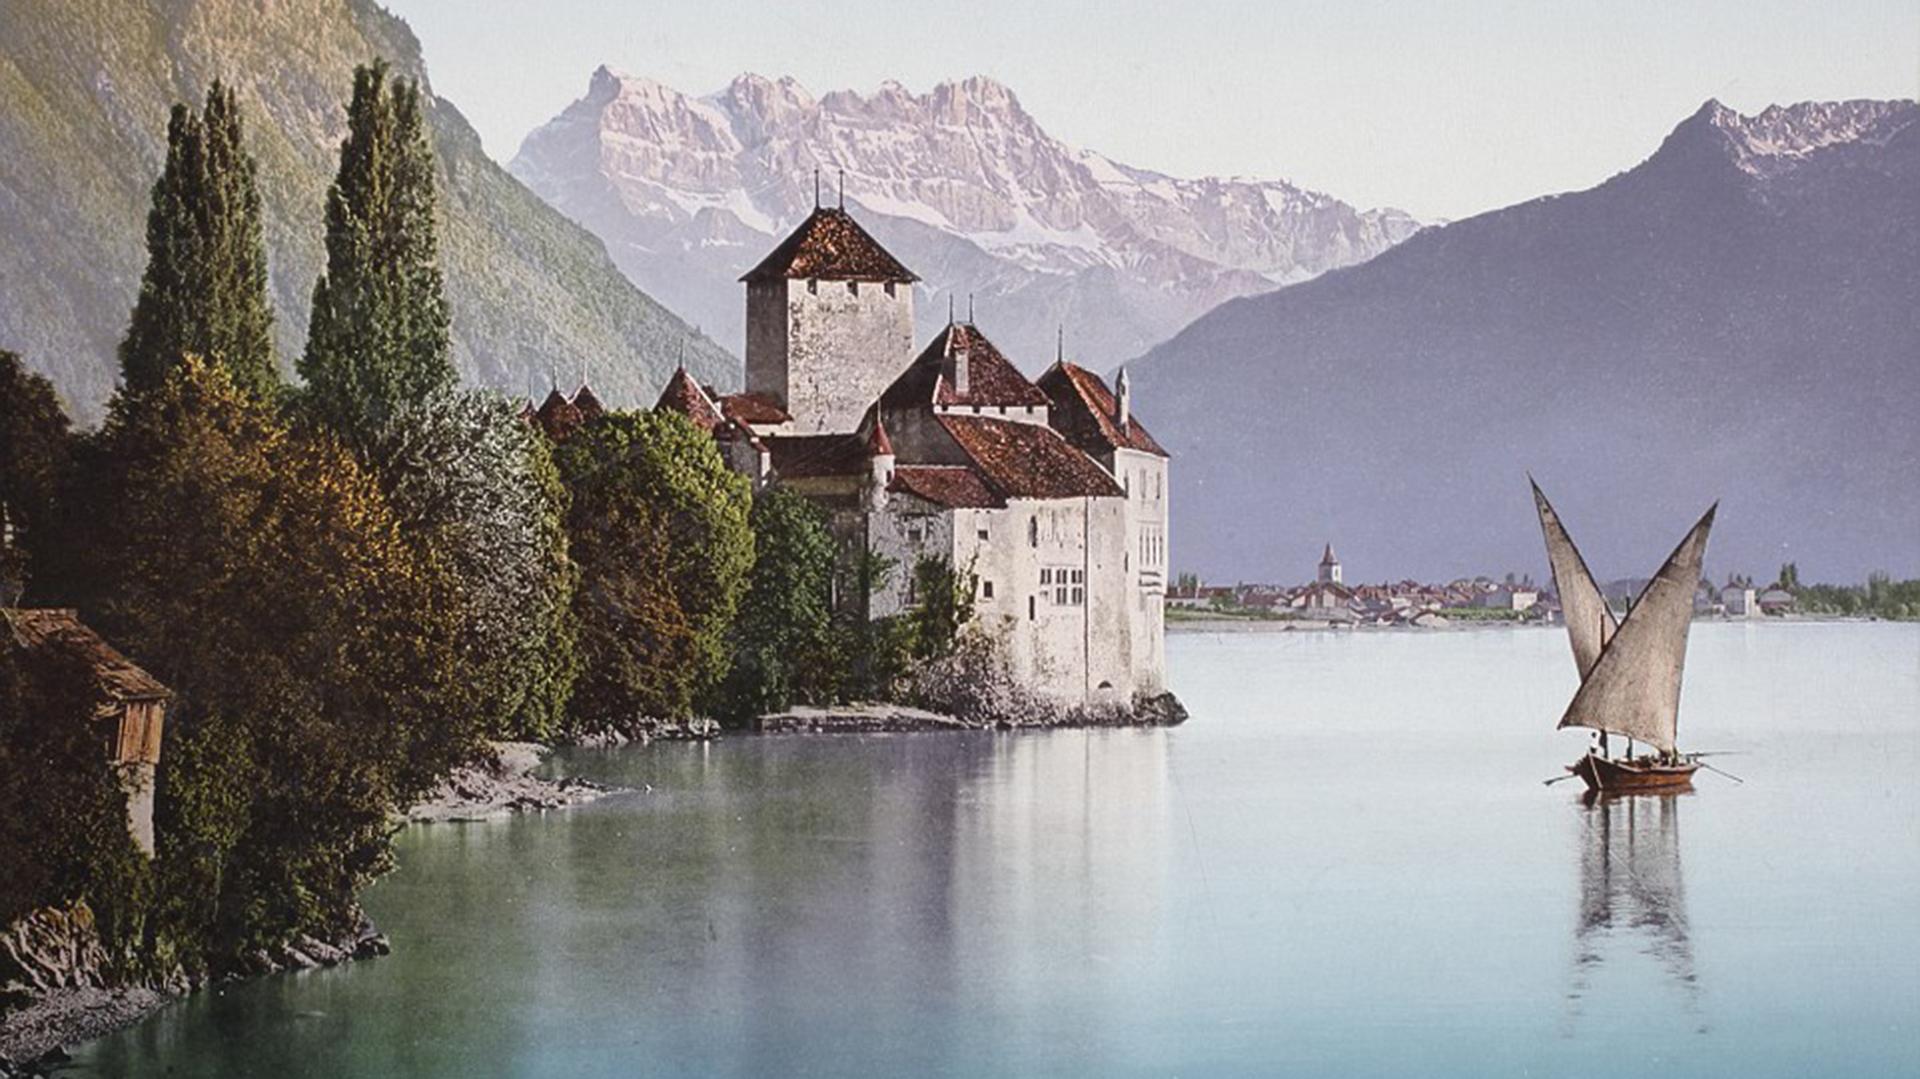 Chateau de Chillon, en el Lago de Ginebra, en Suiza